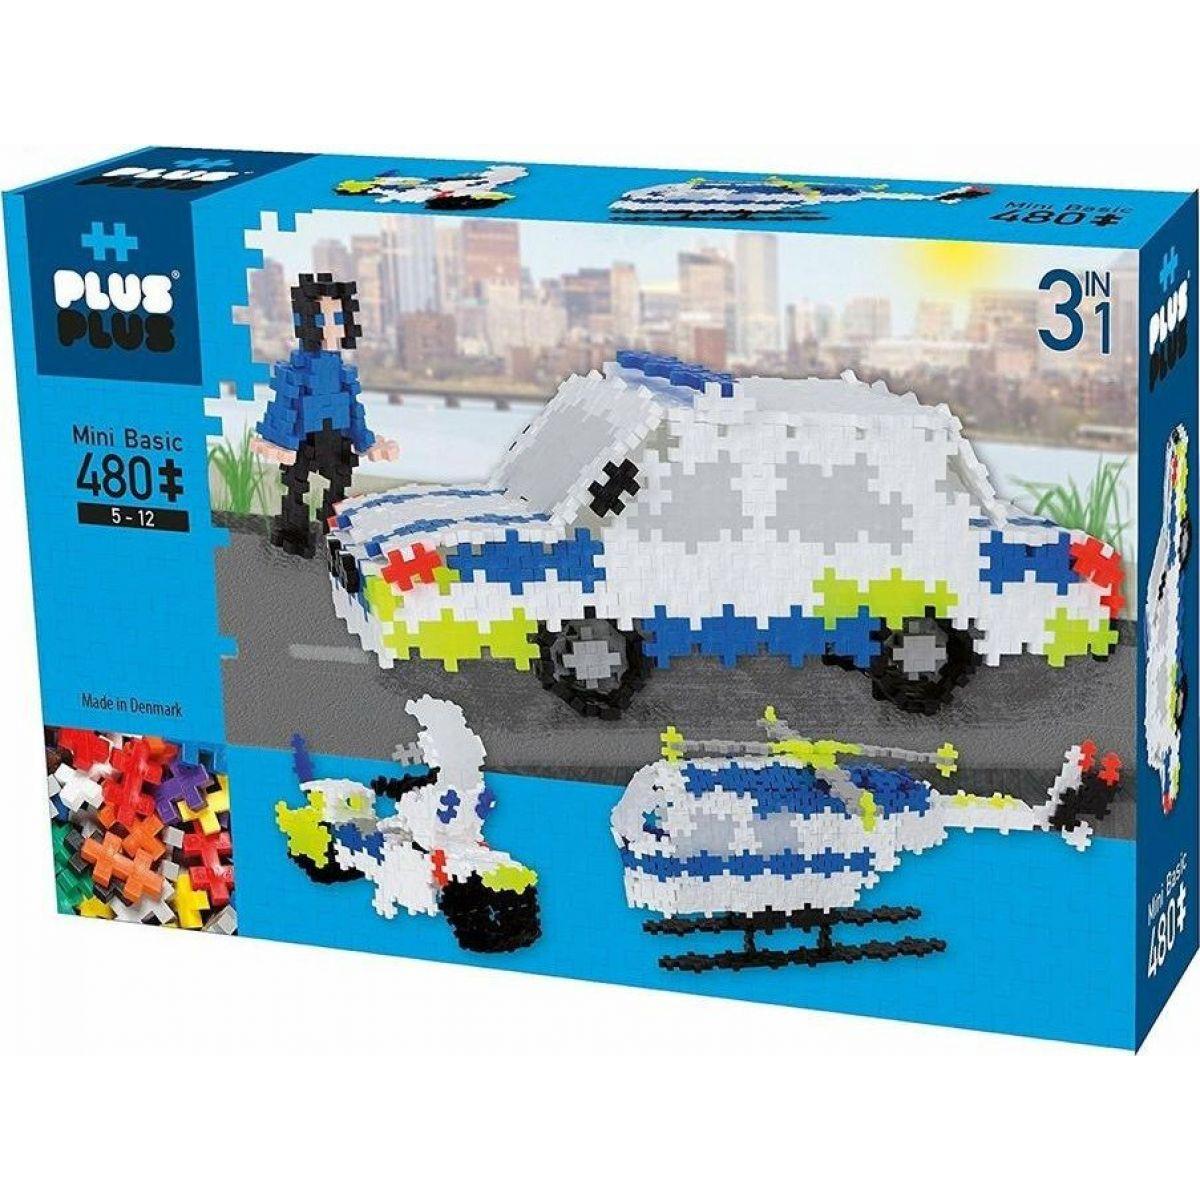 Plus Plus Pastel 480ks Polícia